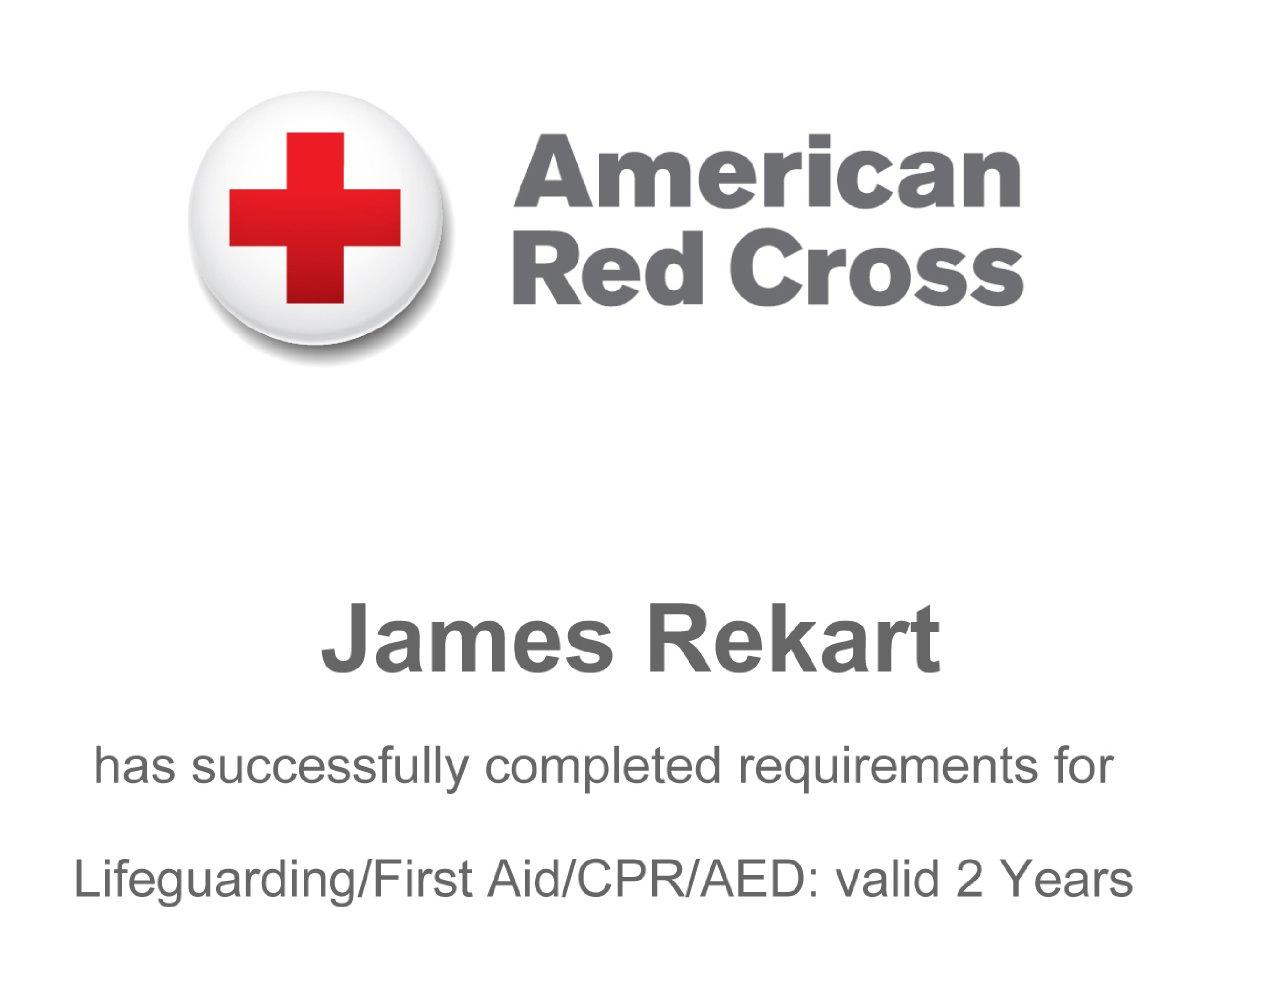 James Rekart